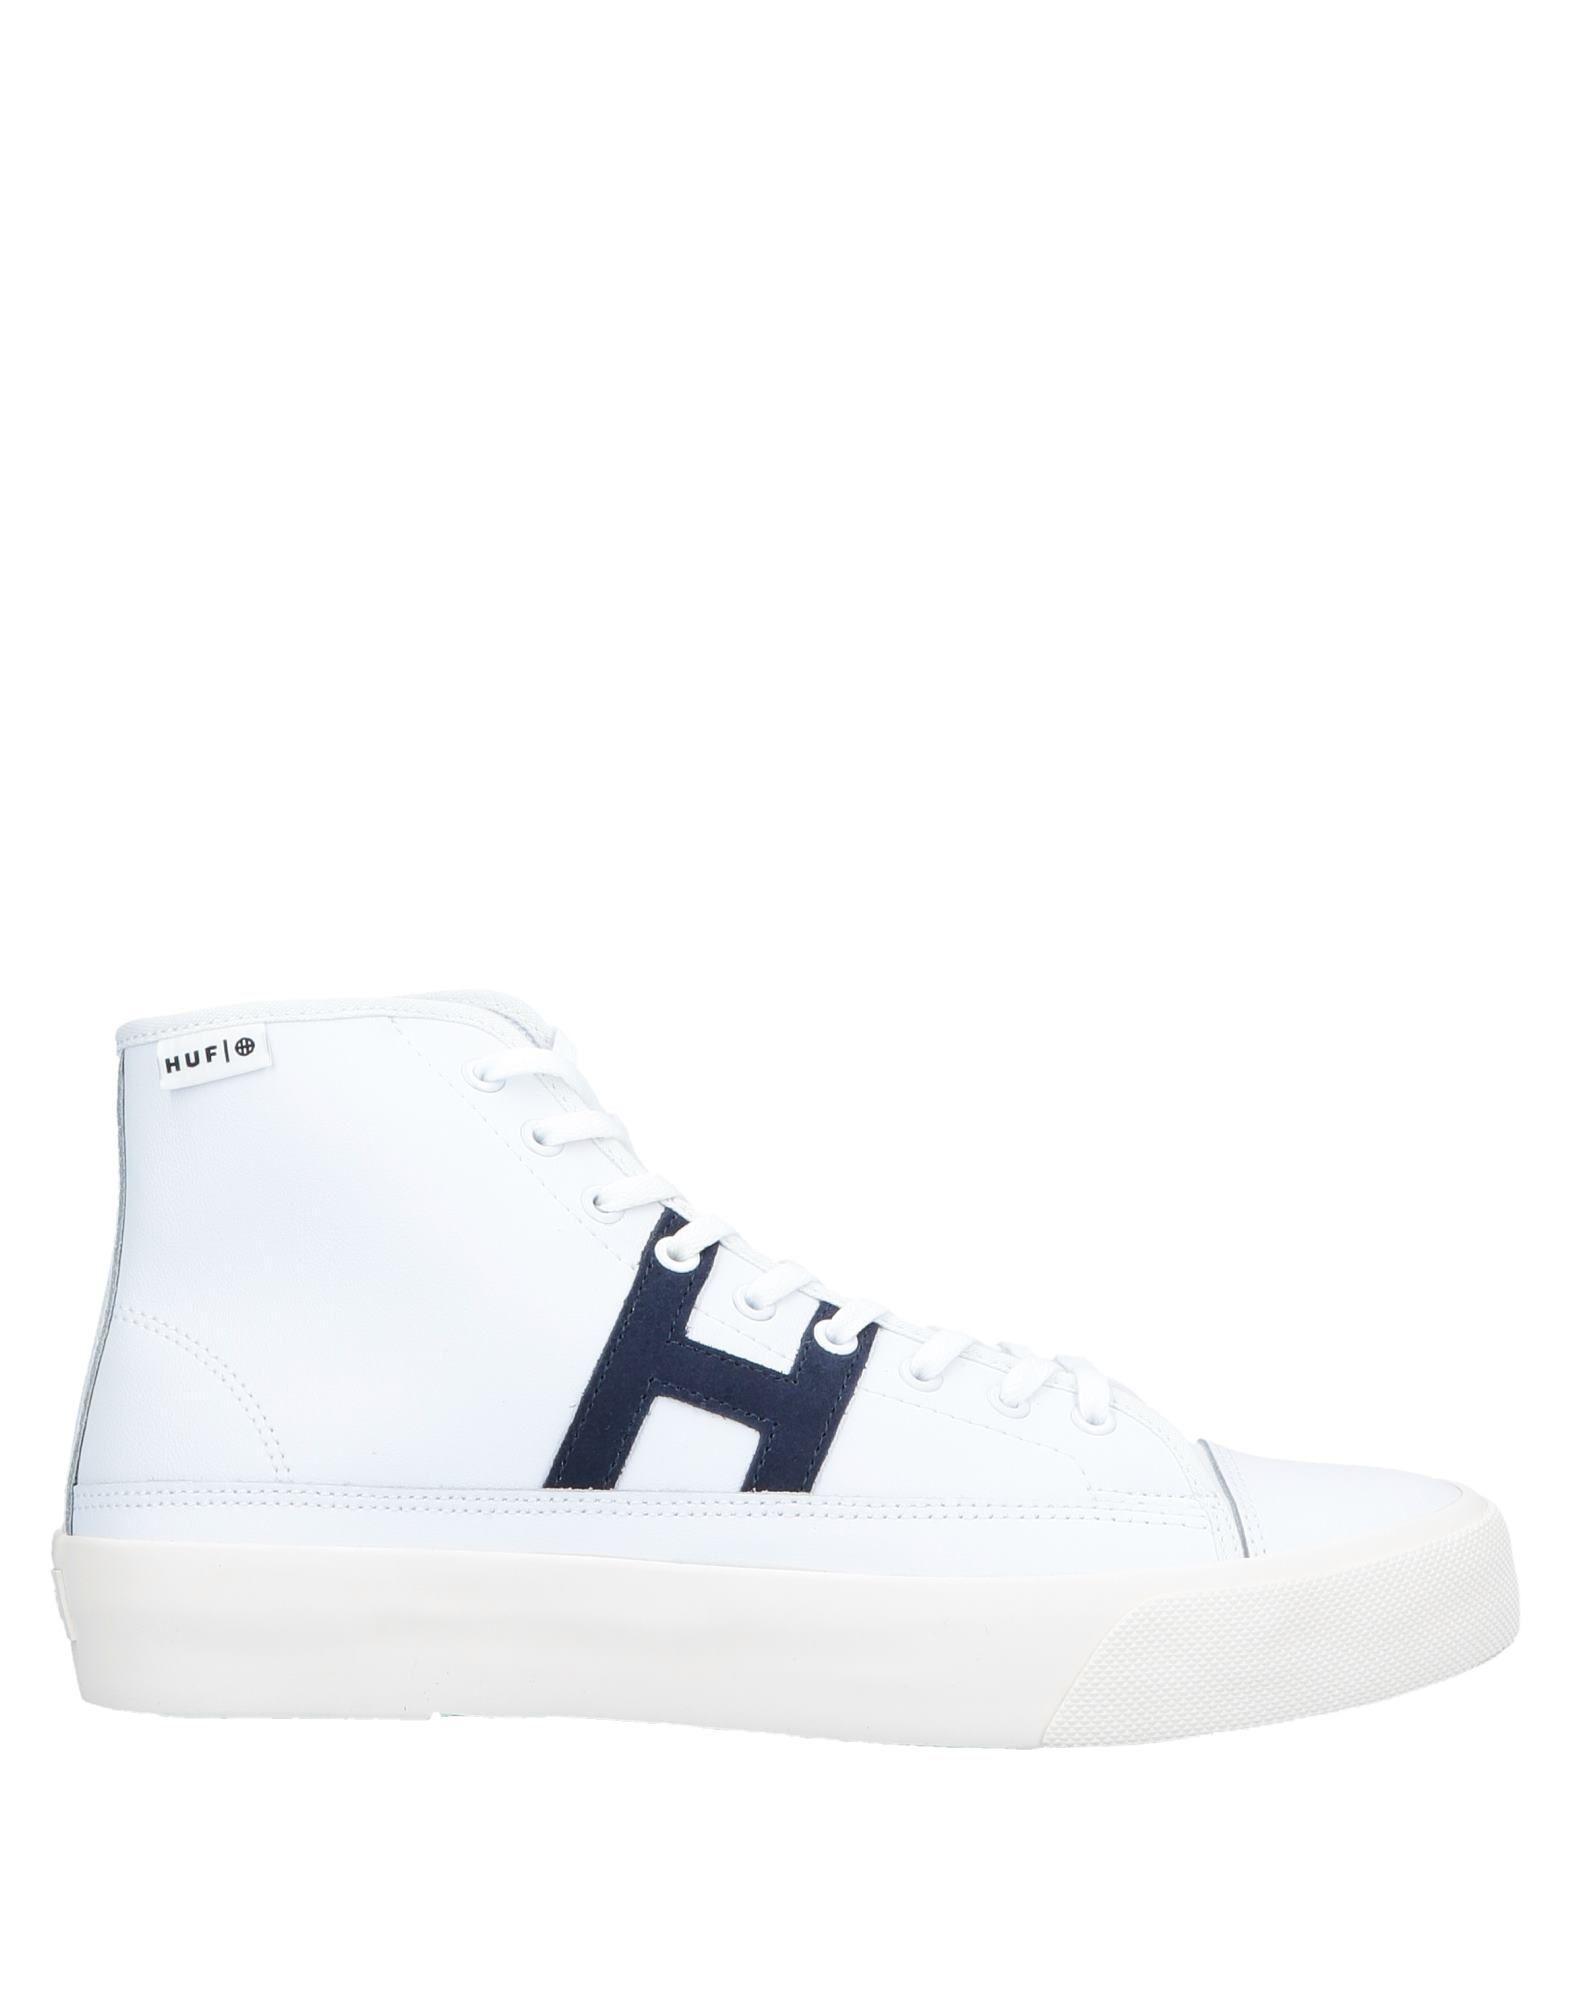 Huf Rubber High-tops \u0026 Sneakers in